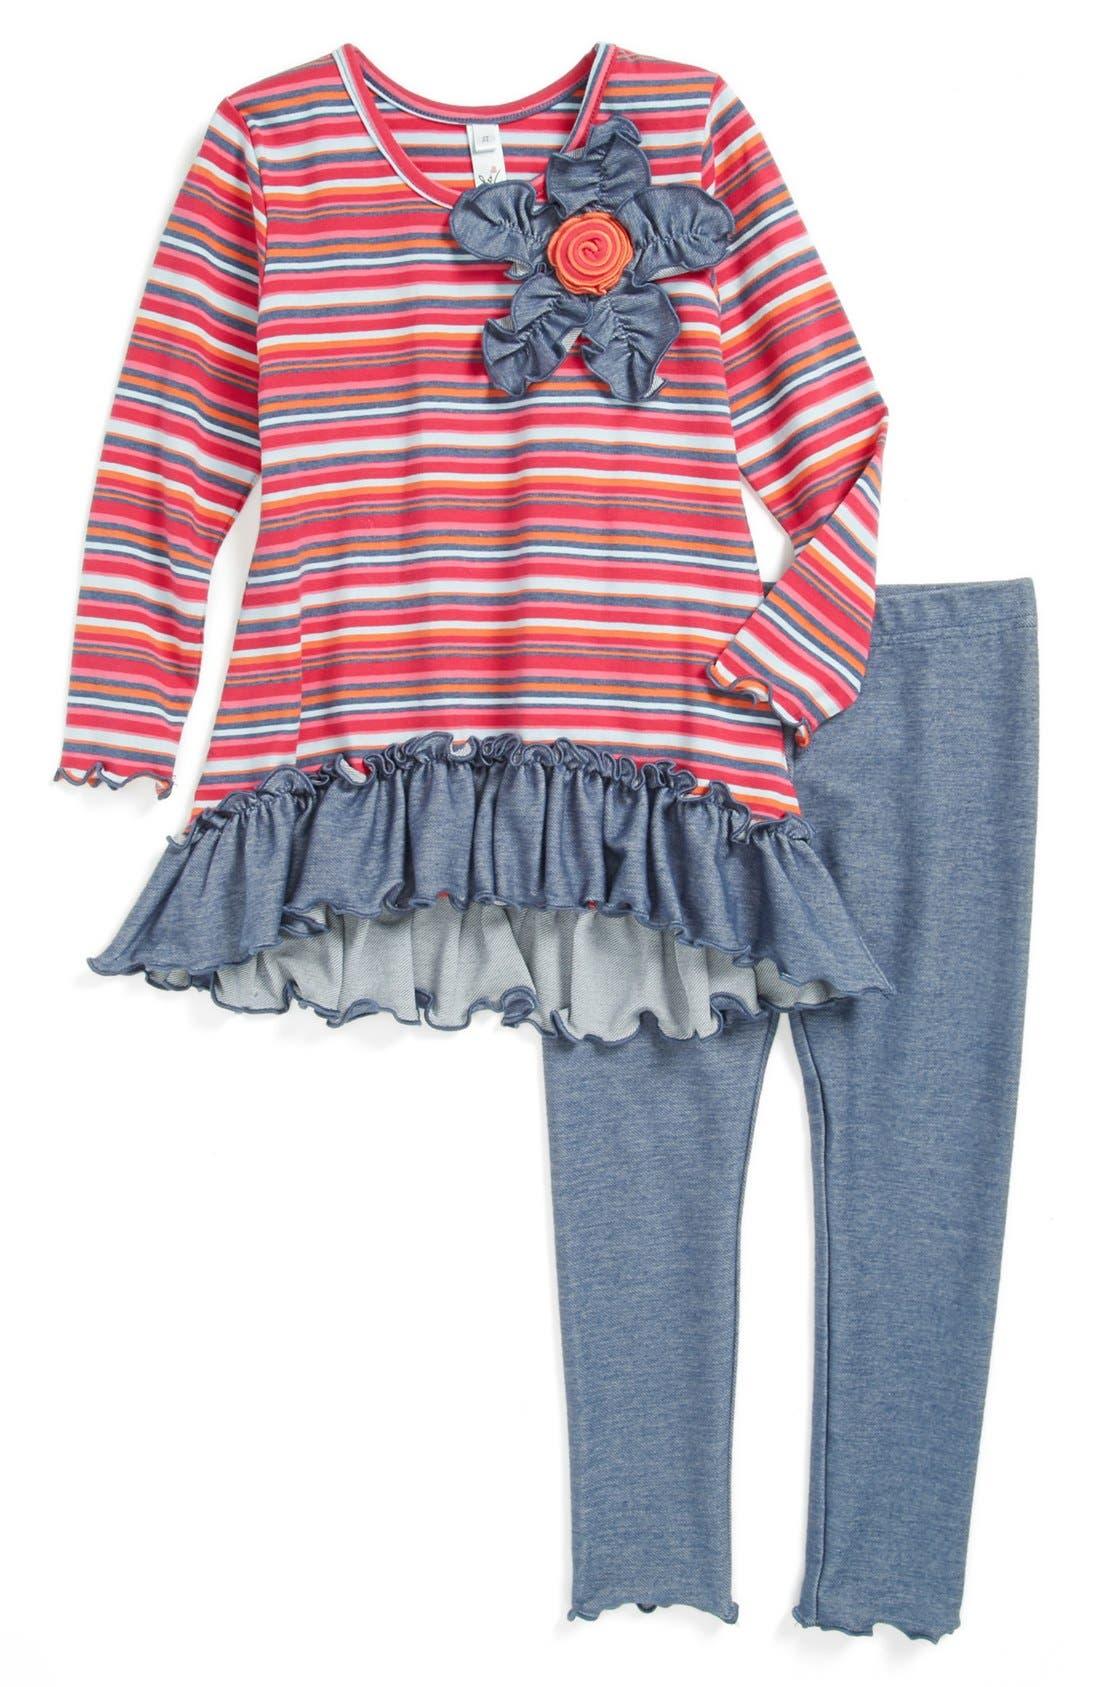 Main Image - Love U Lots Tunic & Leggings (Toddler Girls)